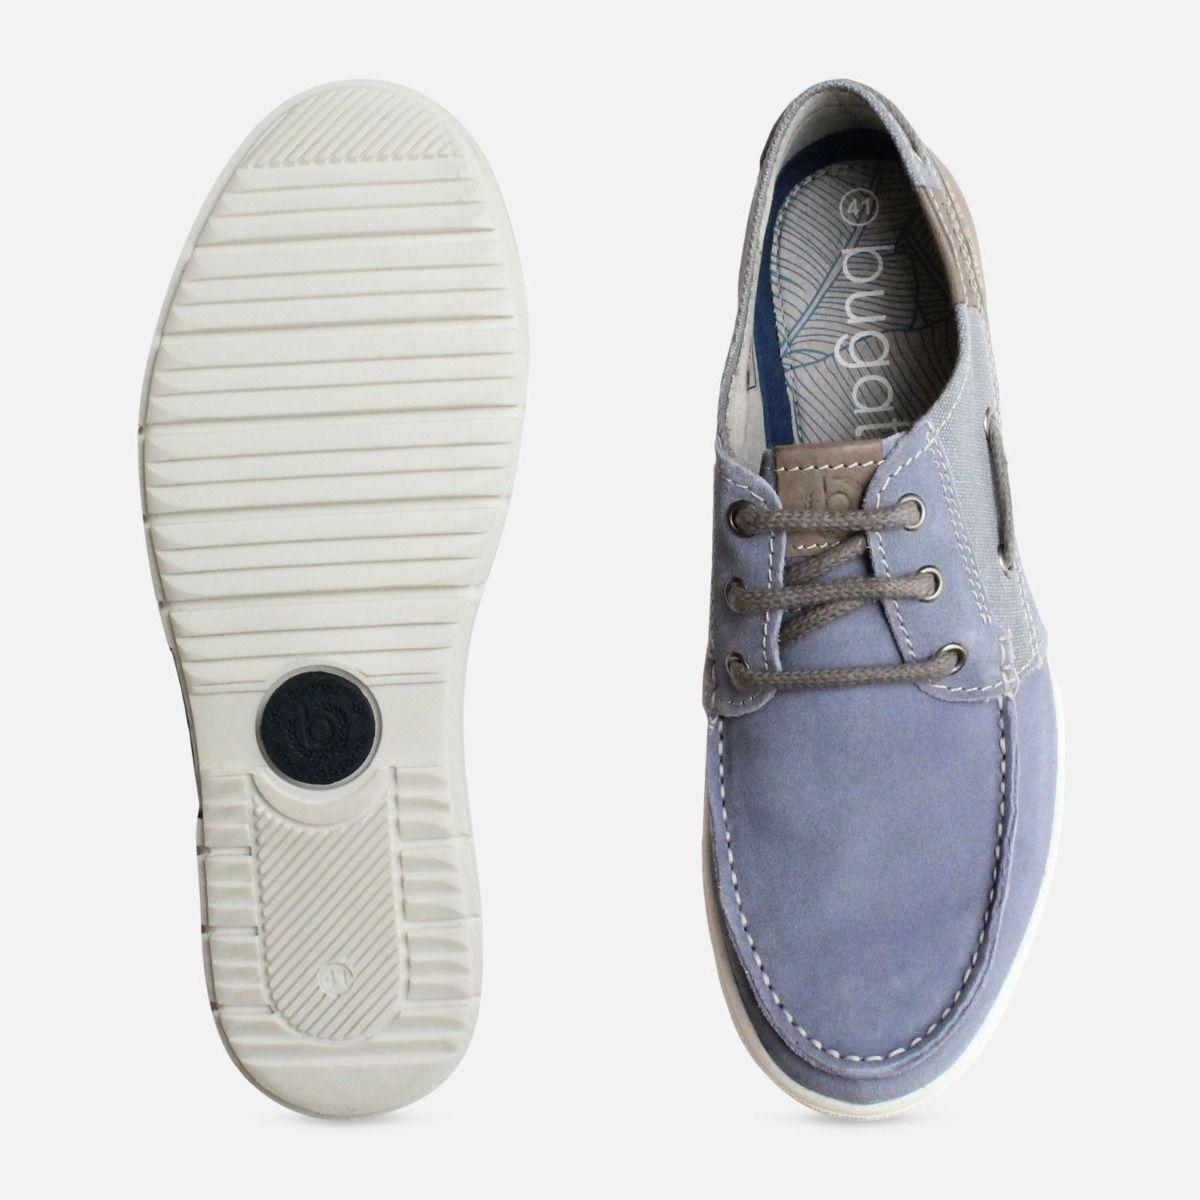 Denim Blue Suede Boat Shoe by Bugatti